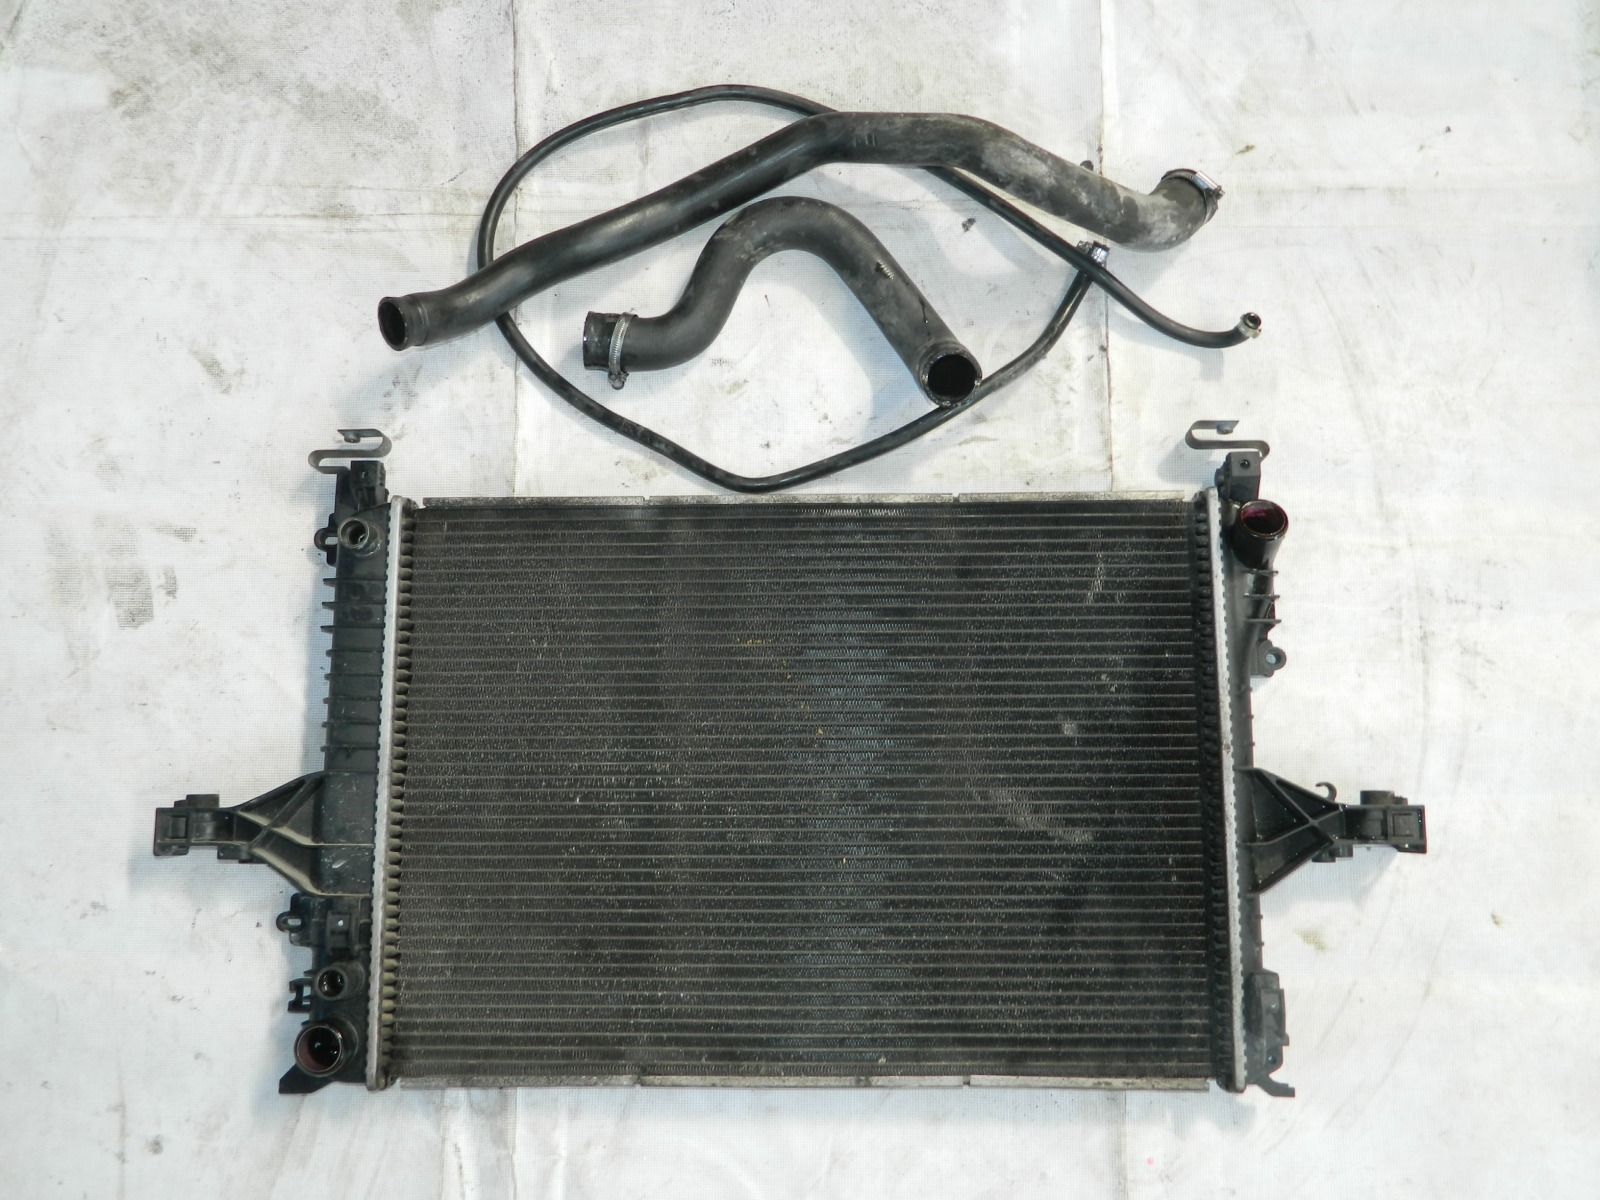 Патрубок системы охлаждения Volvo S60 (б/у)